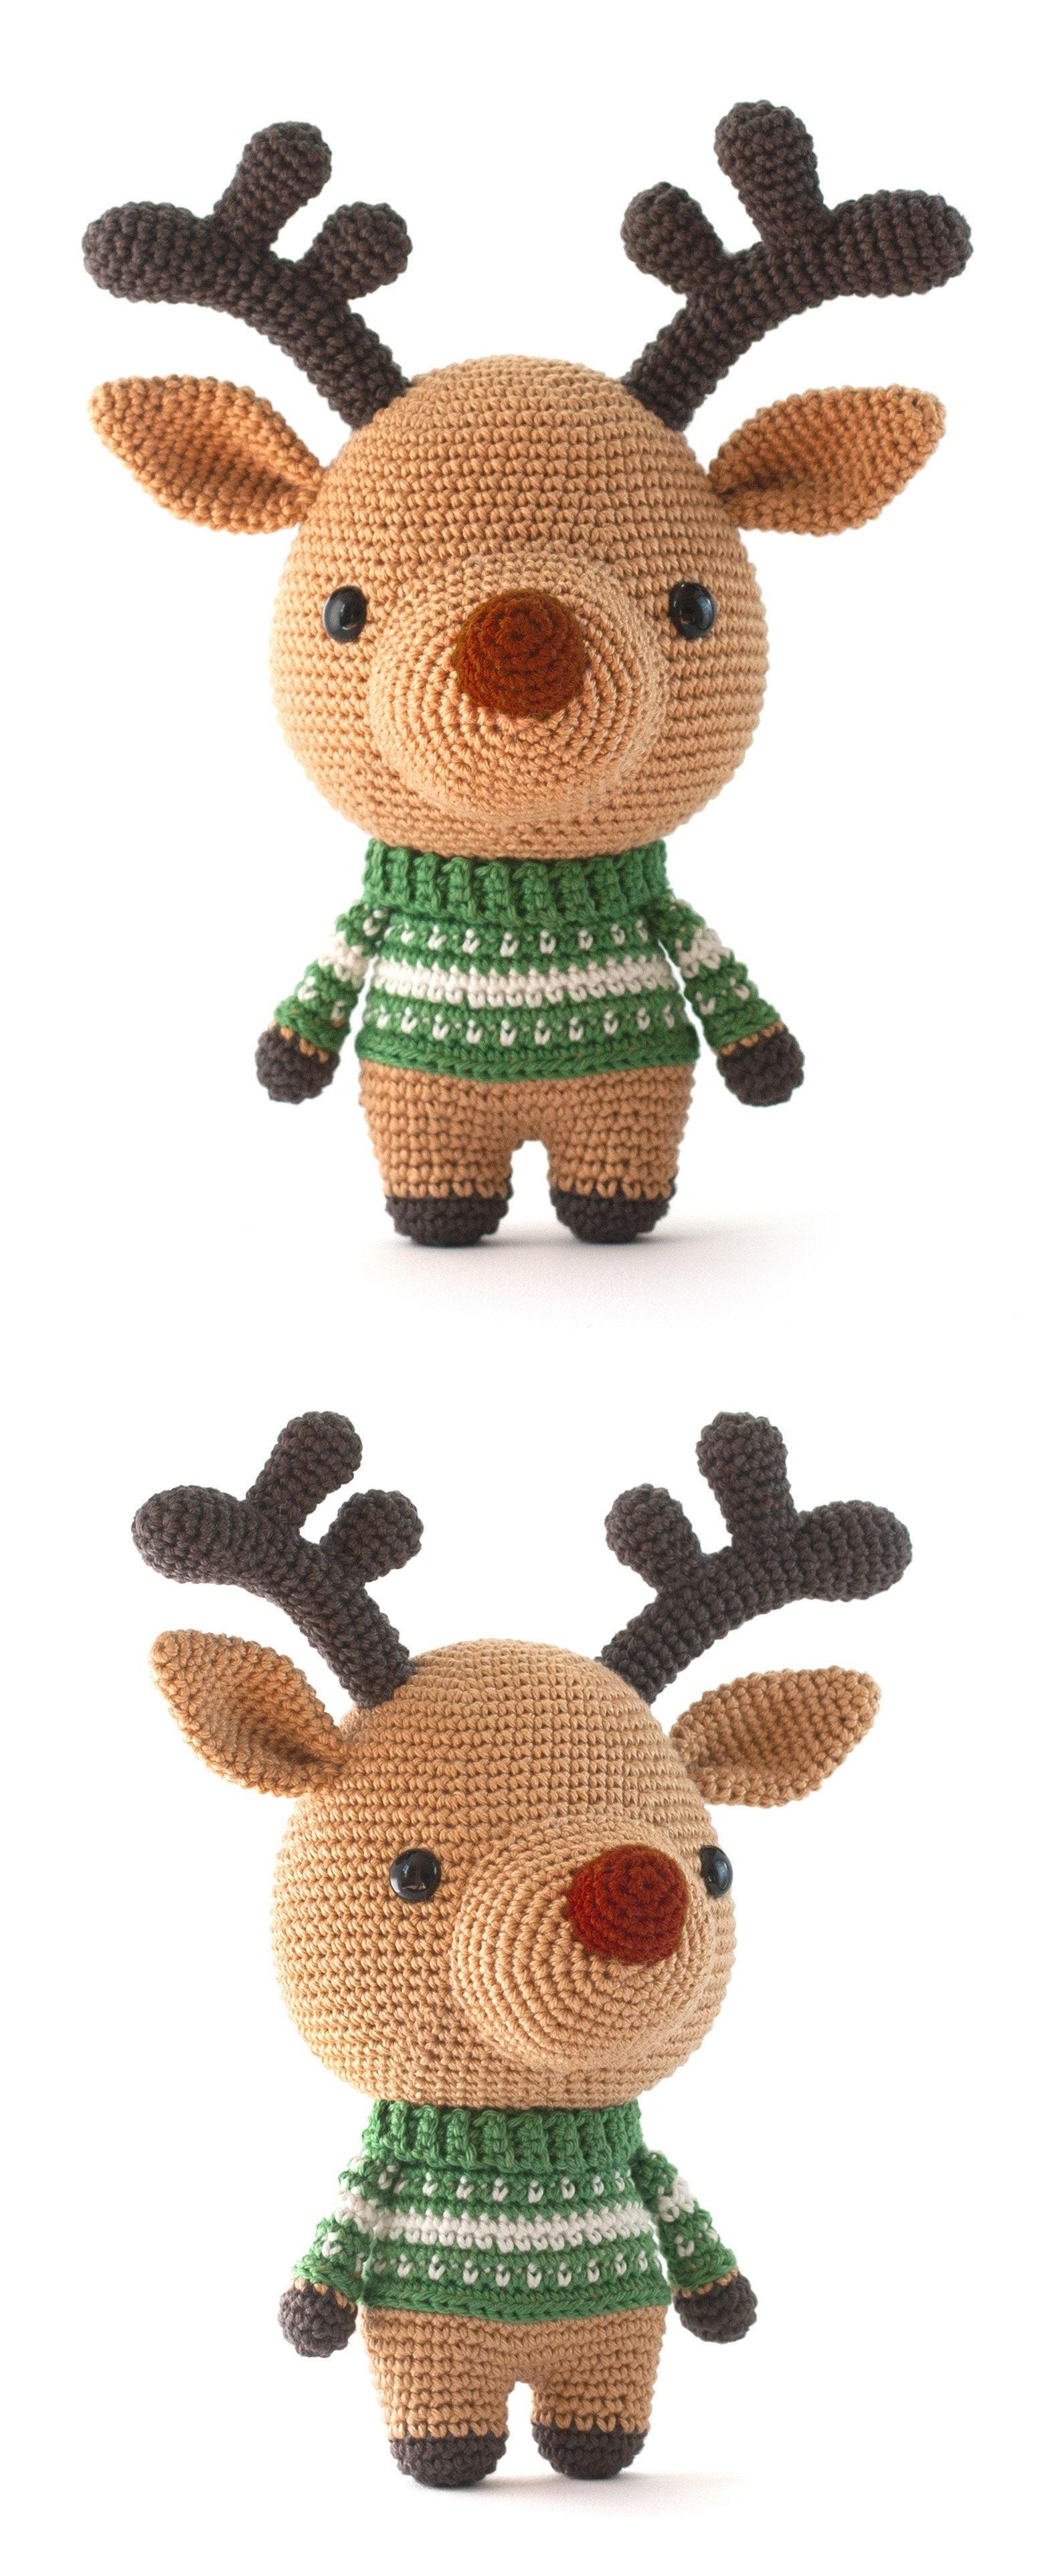 Christmas deer amigurumi pattern | Patrones amigurumi, Amigurumi ... | 3848x1584